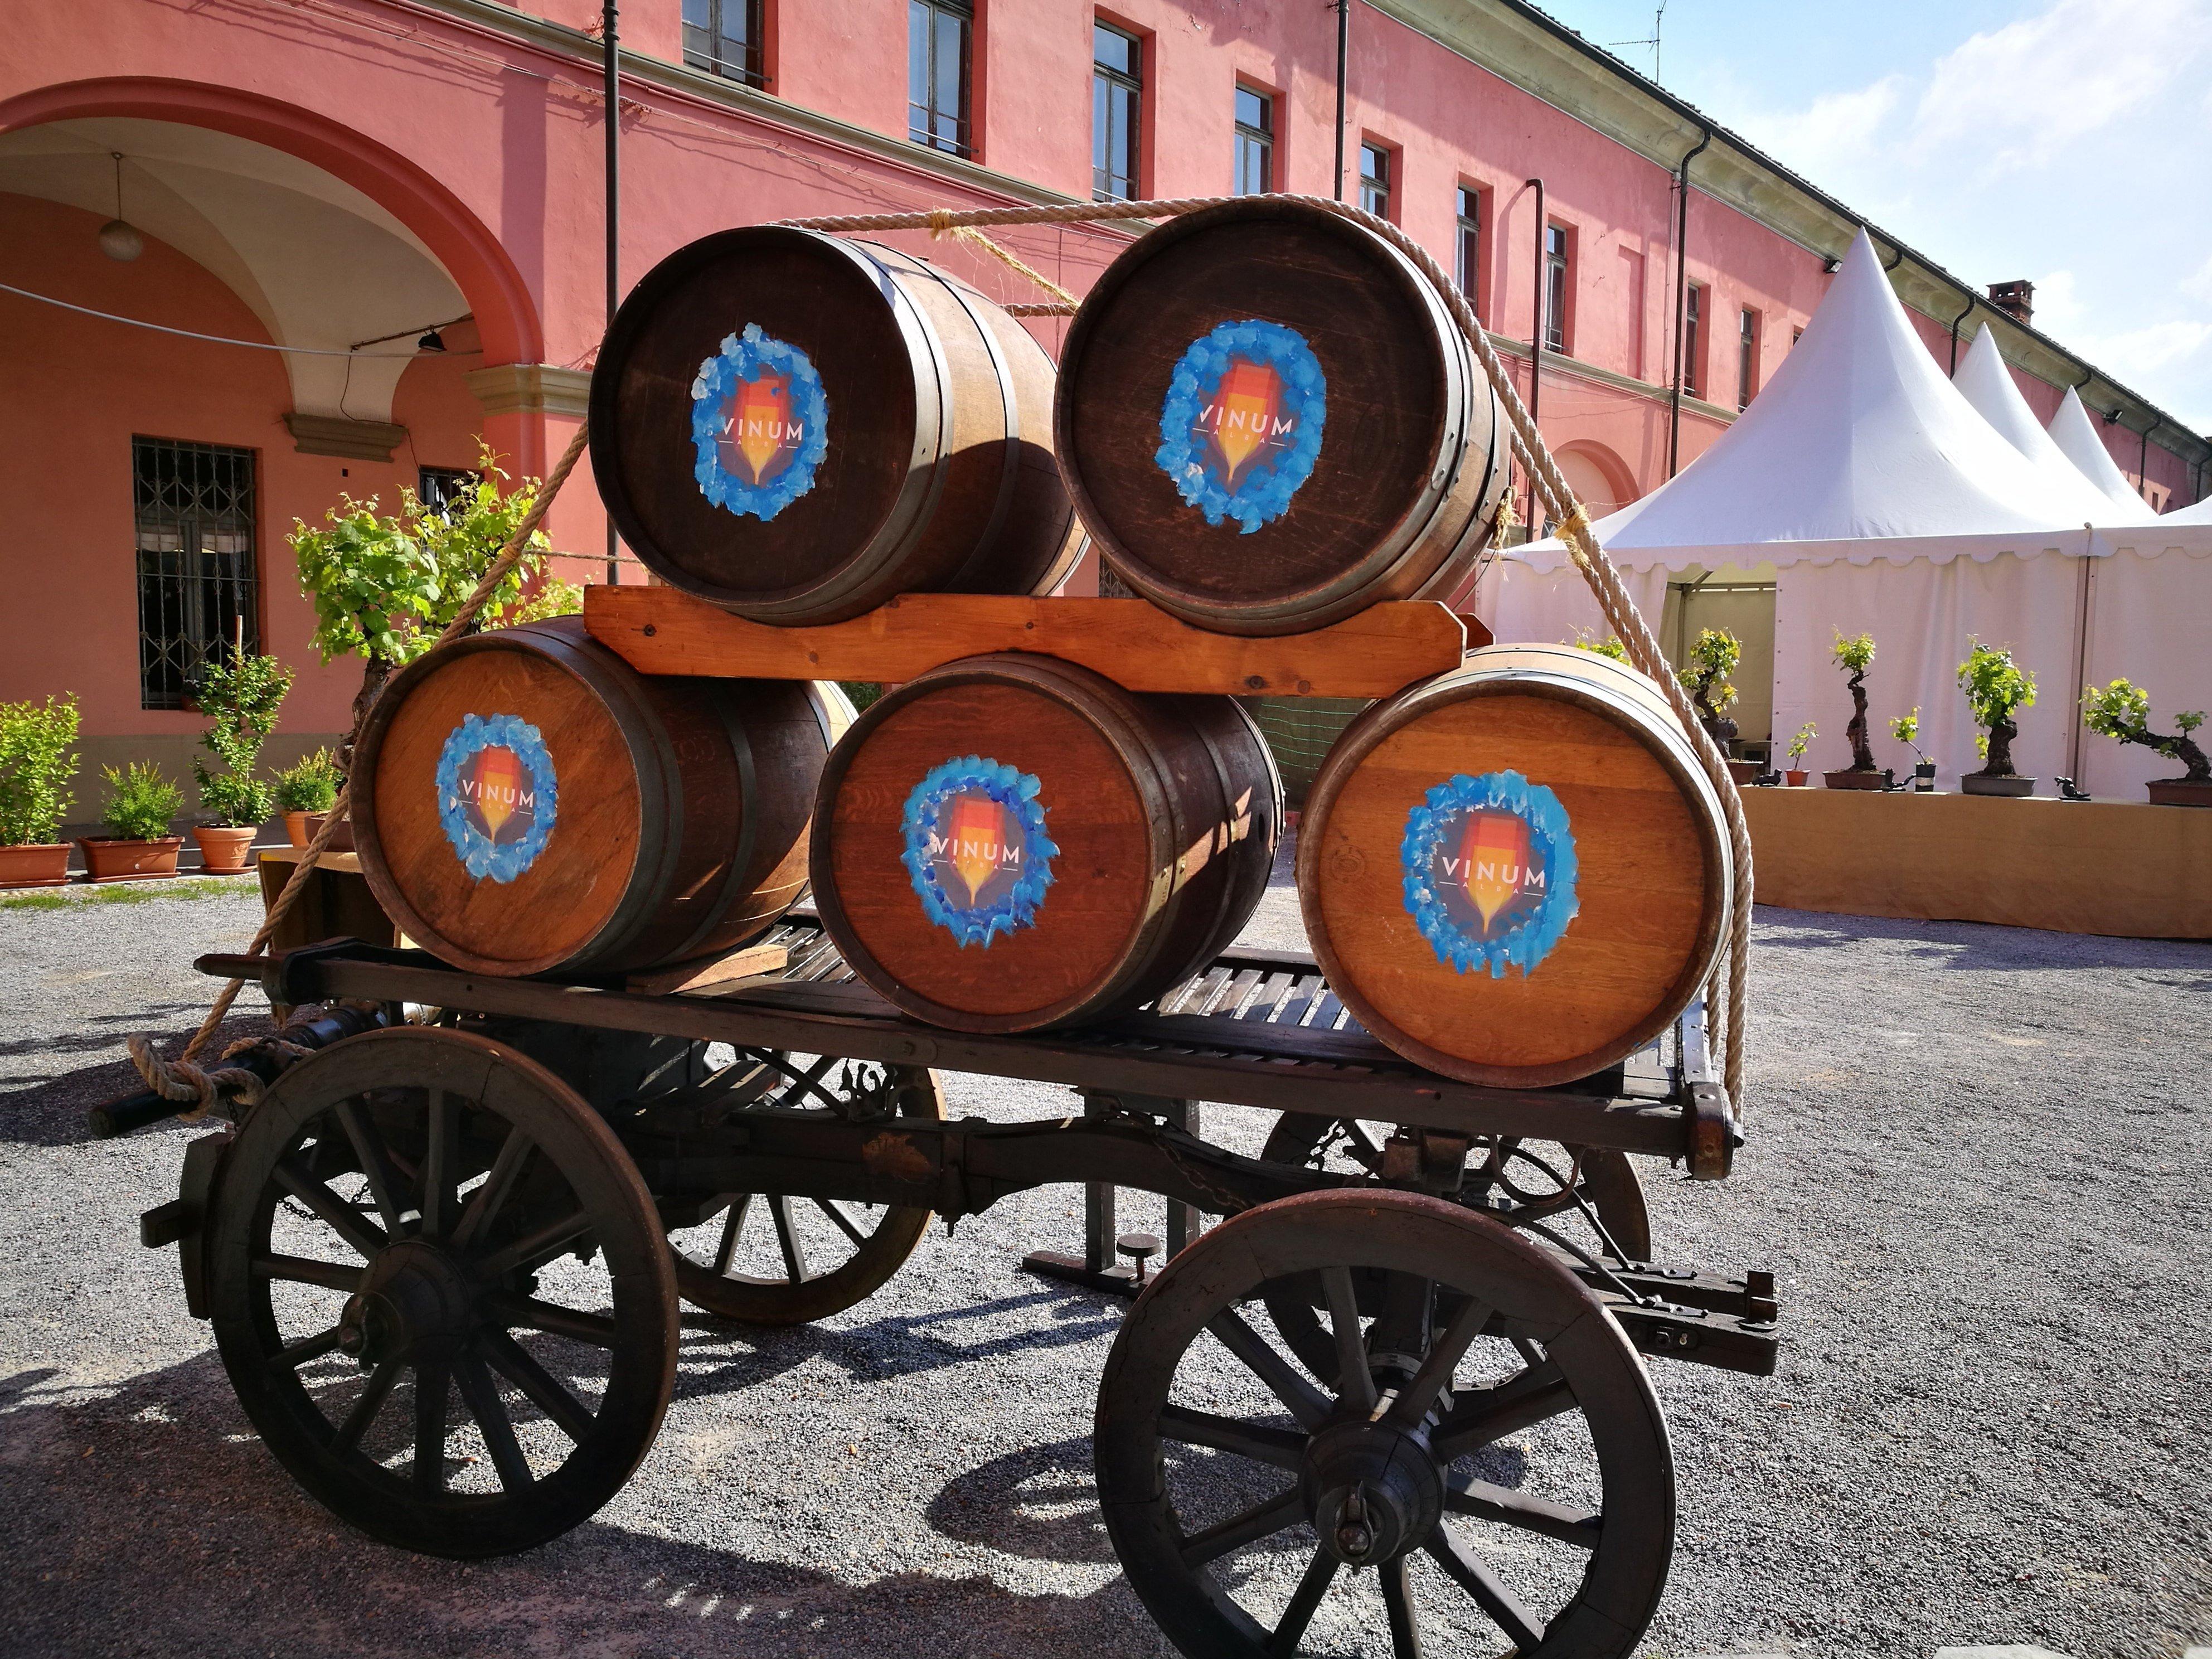 La festa del vino di Alba